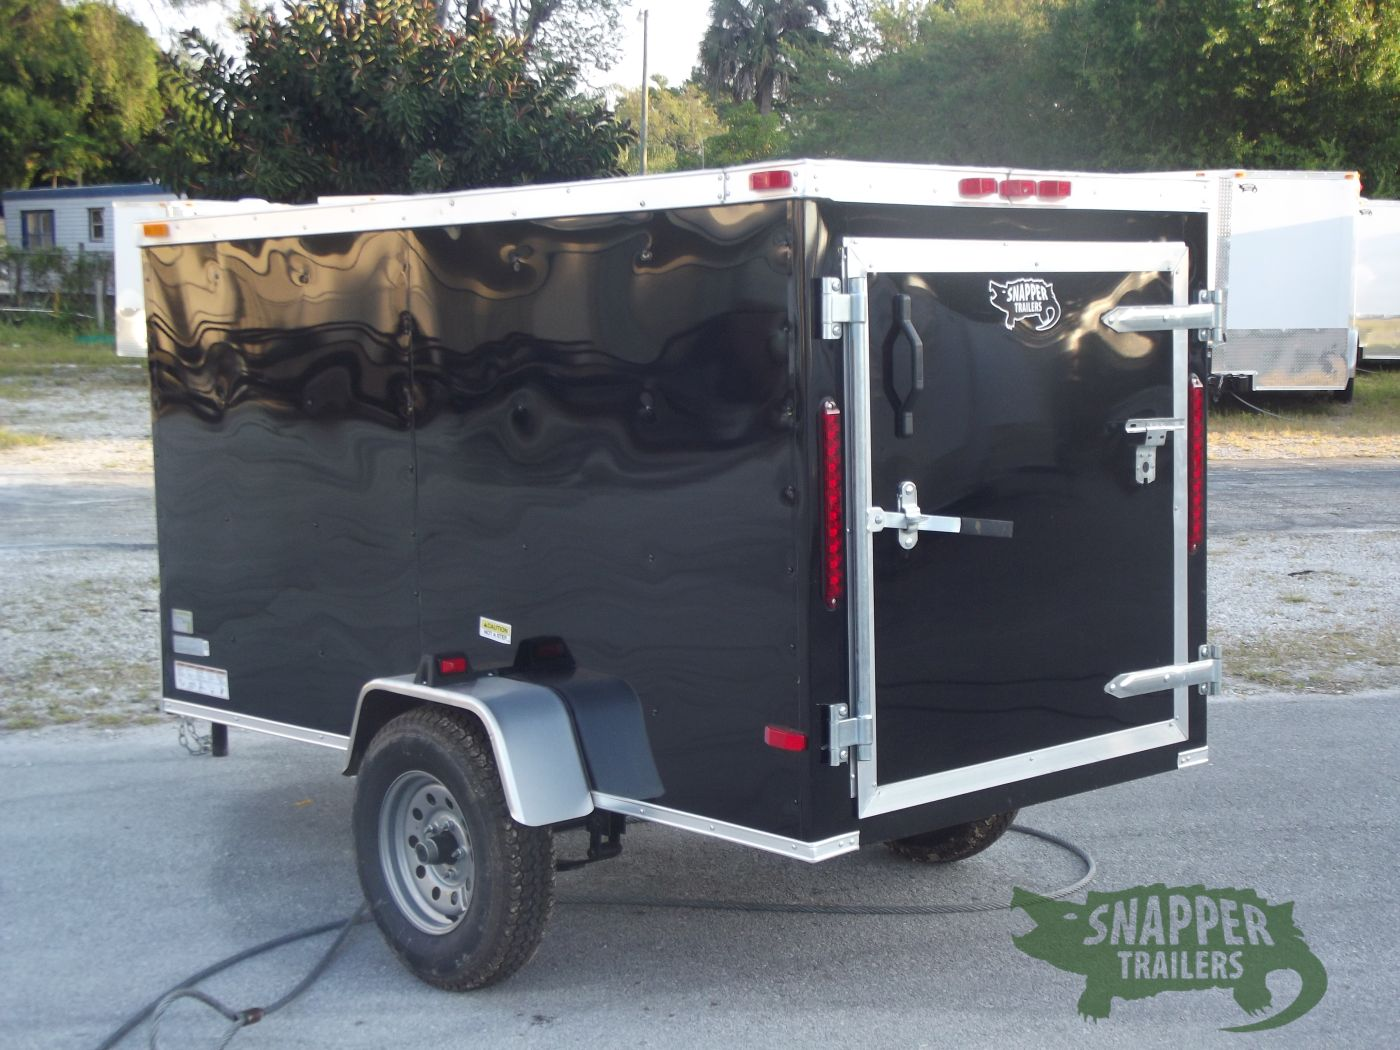 Side Door Tractor Trailer : Sa trailer black single door side snapper